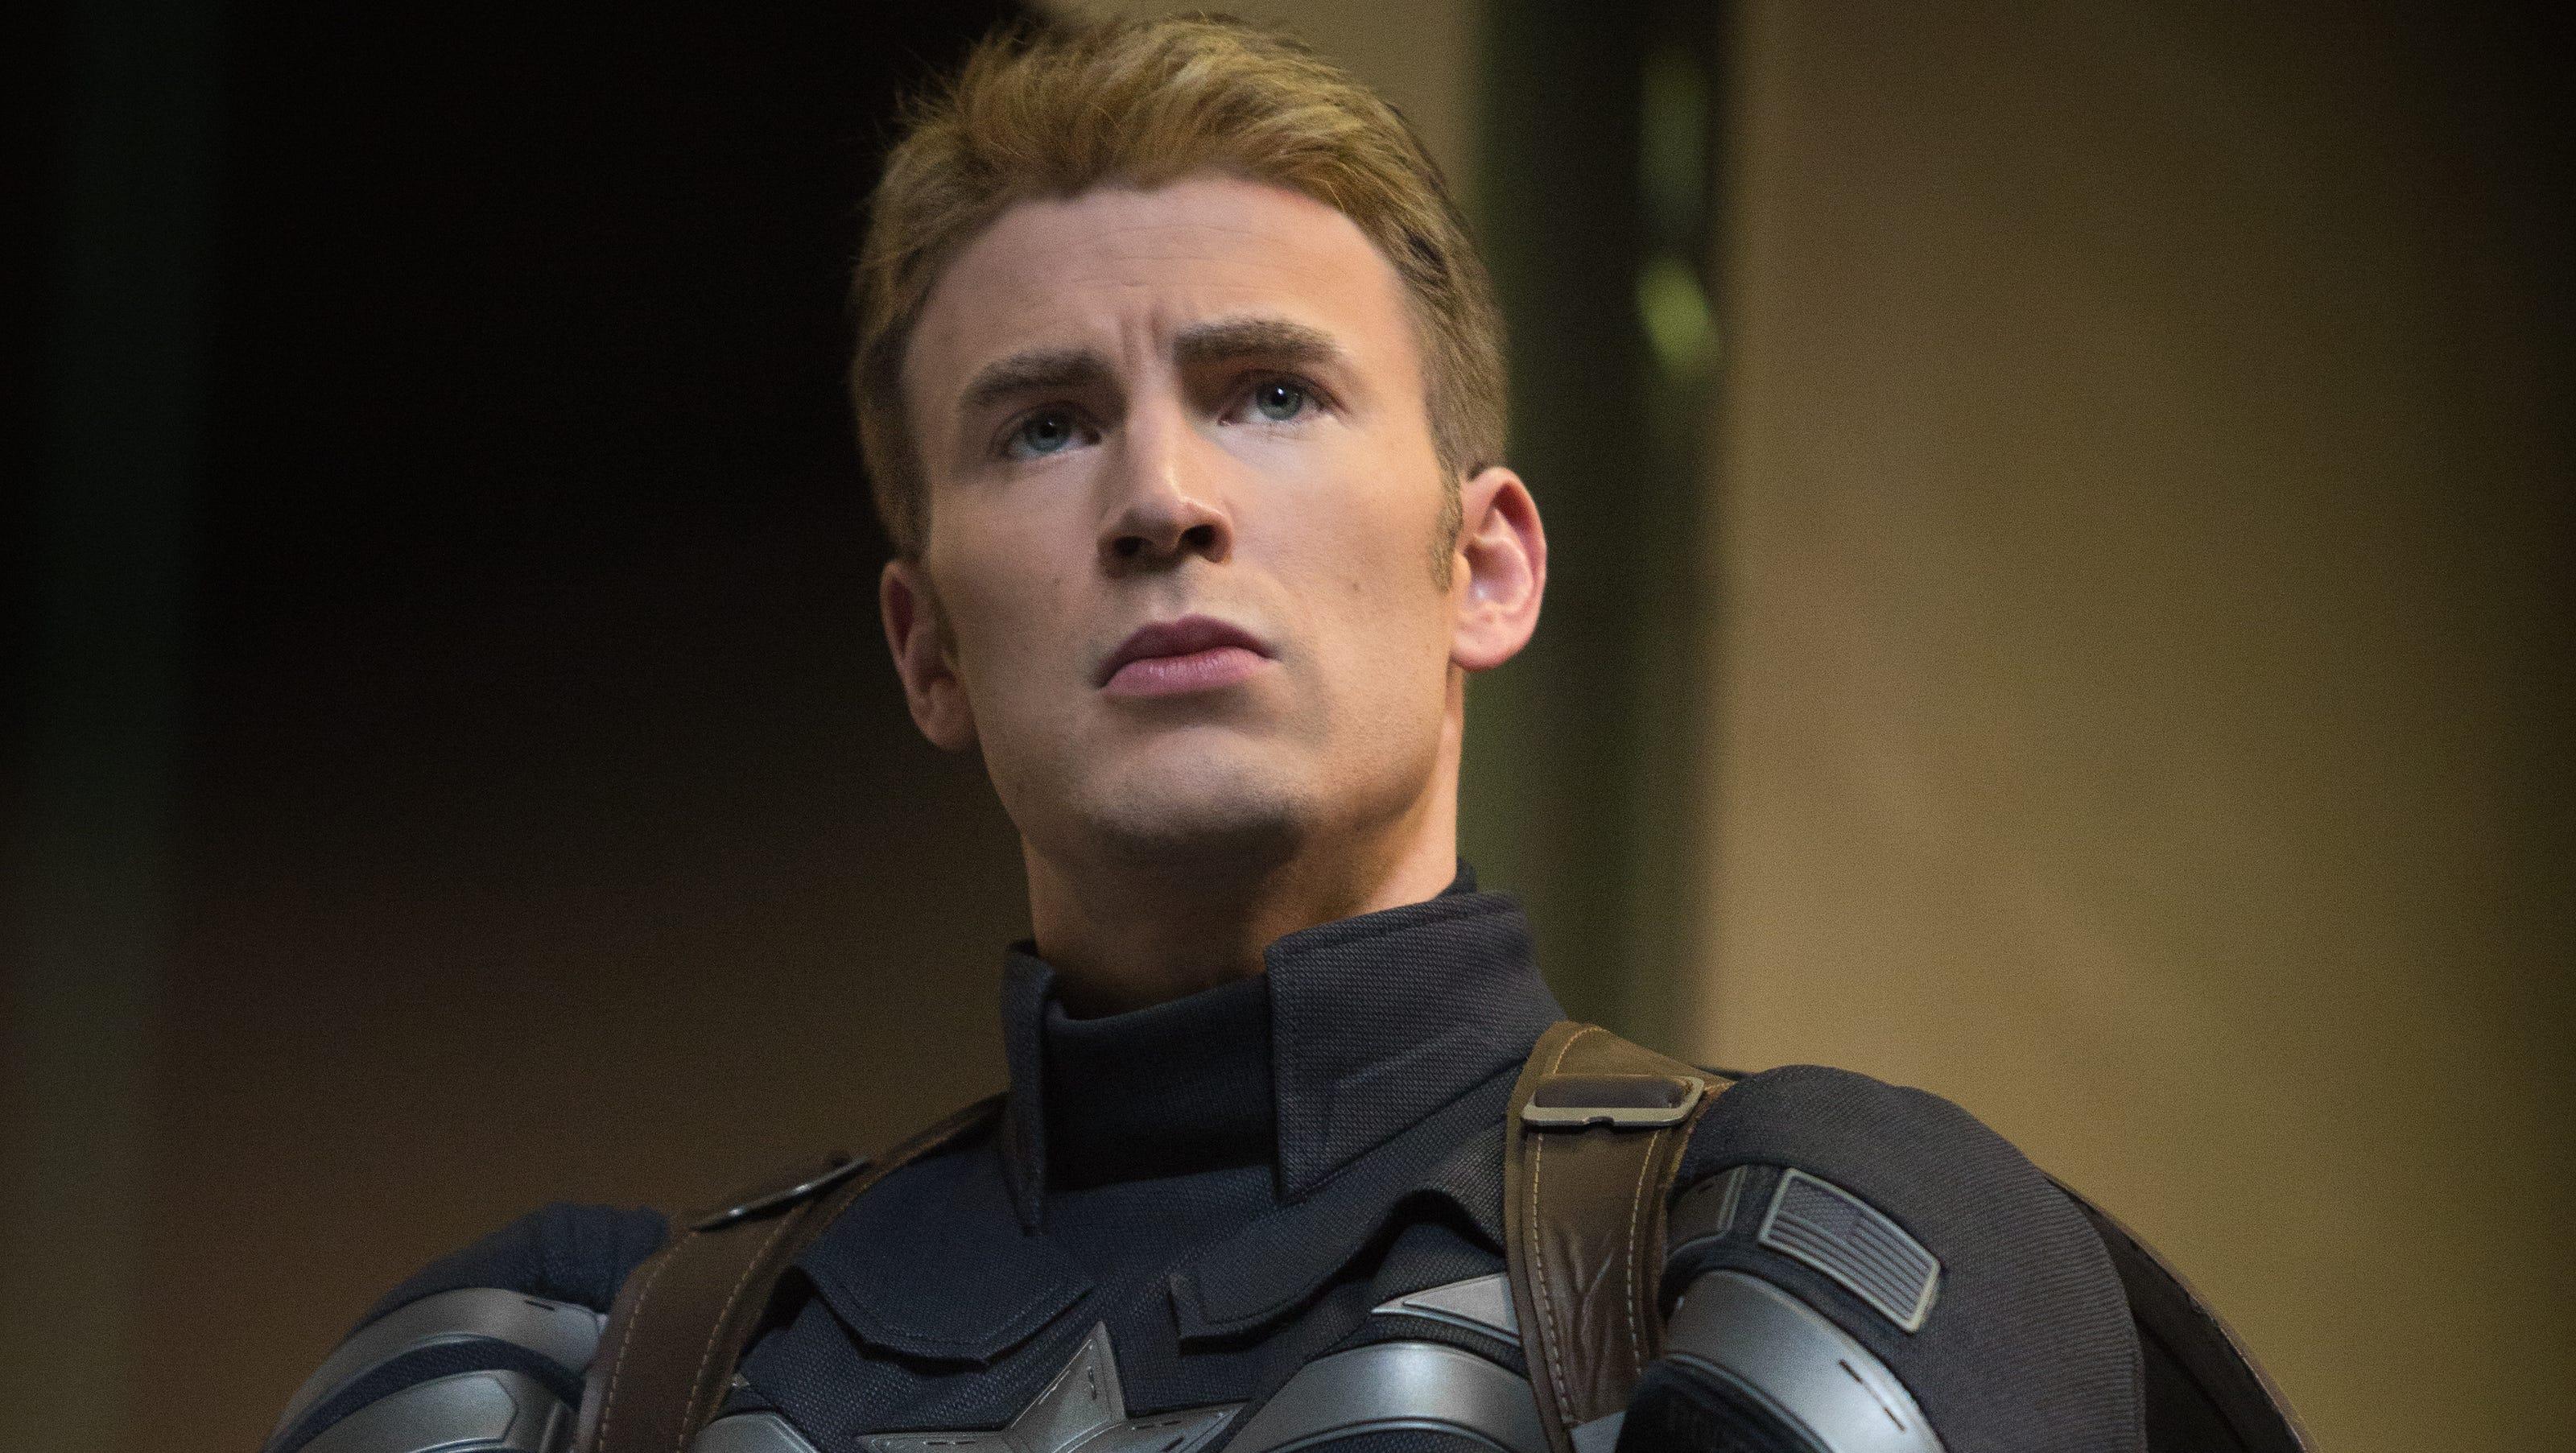 Captain America flies high in Winter Sol r